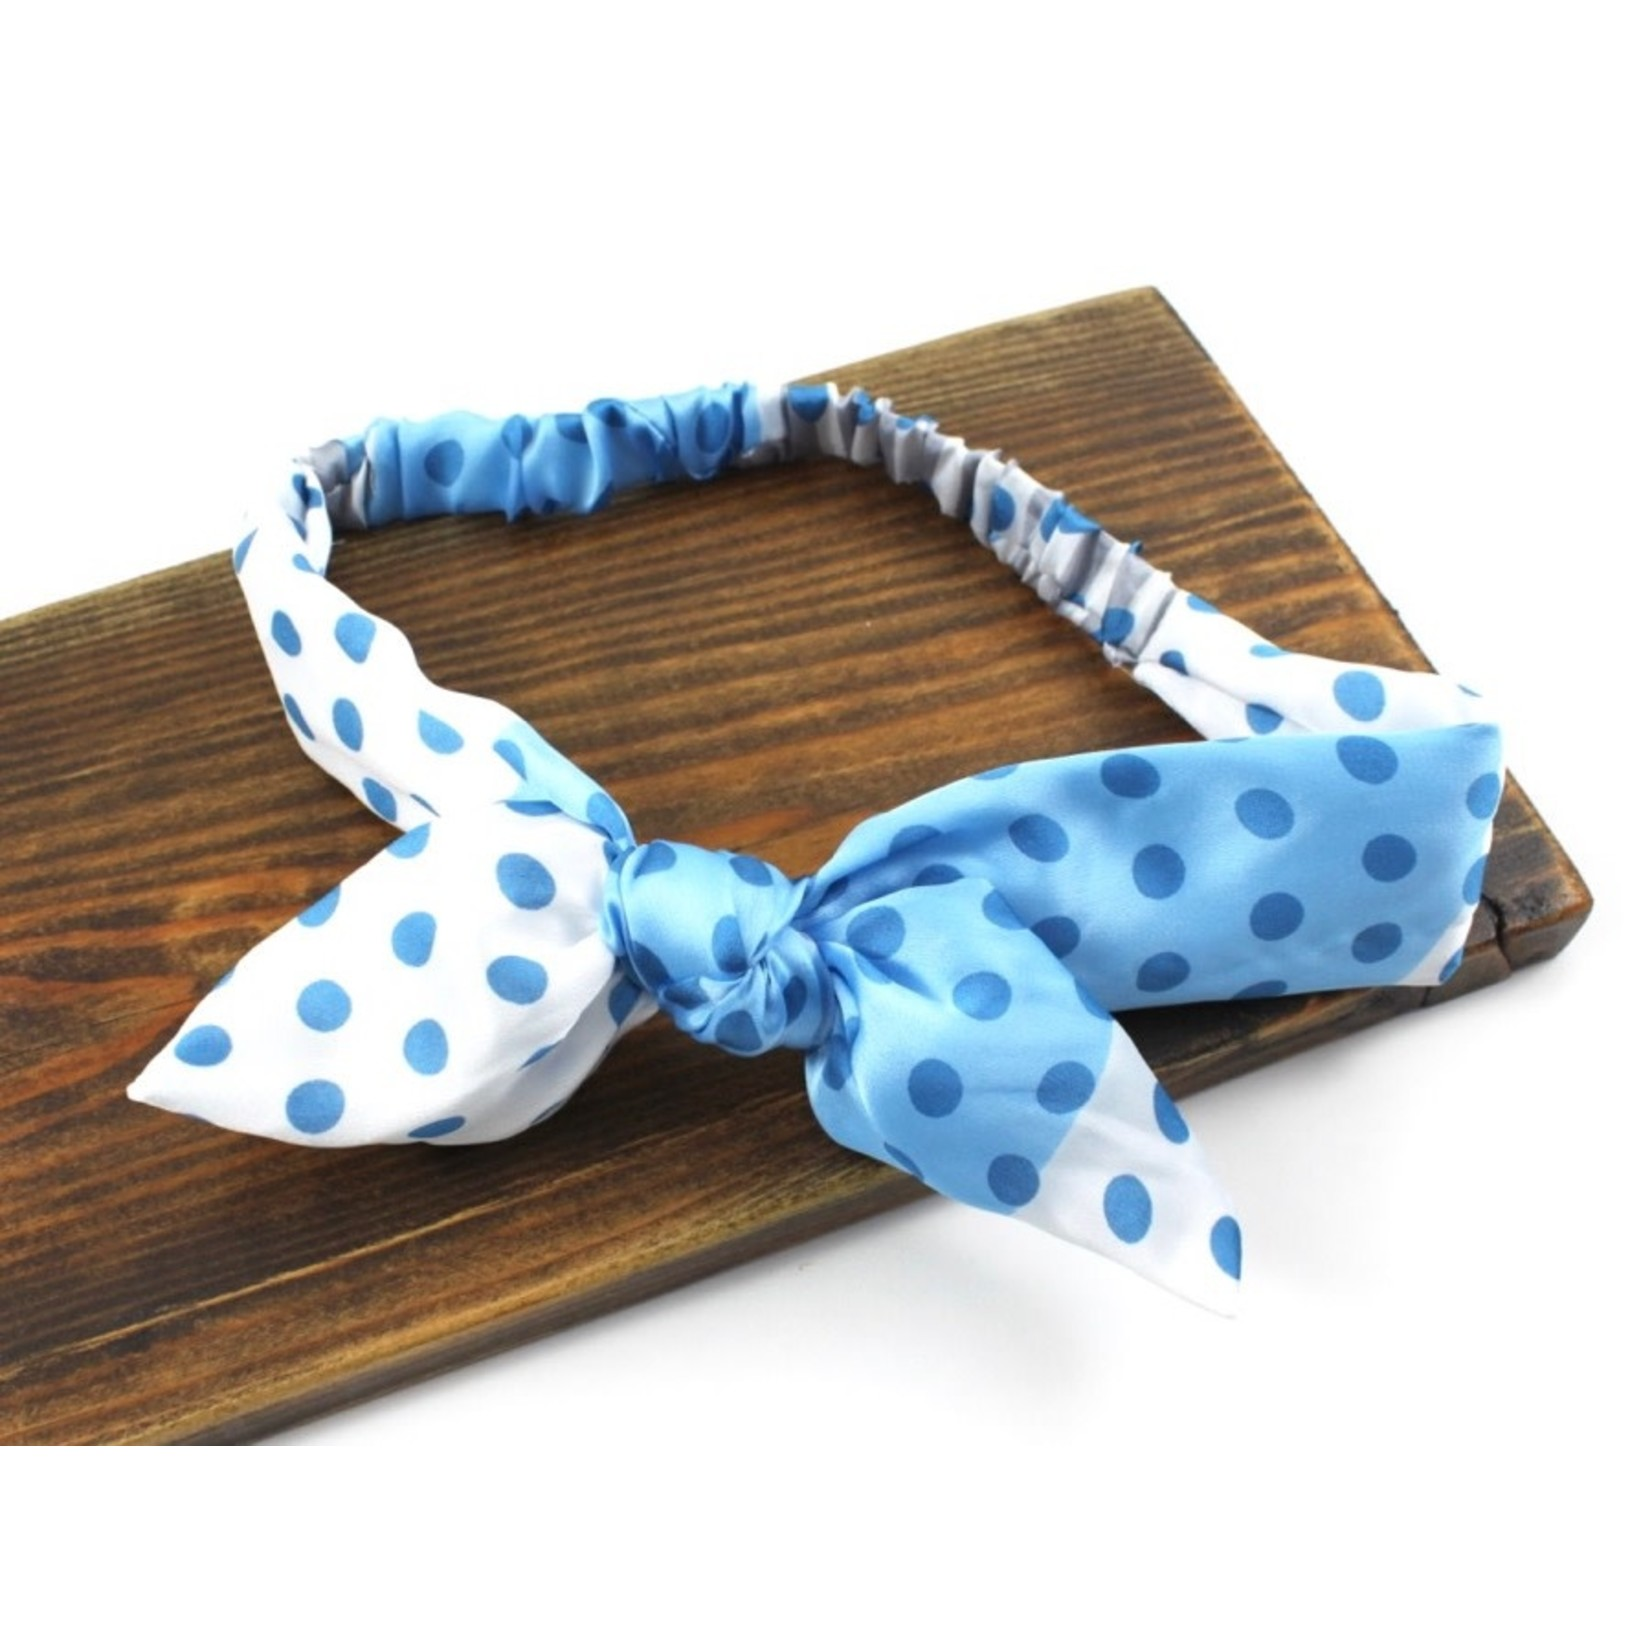 Pullover Headband in Blue w/ Polka Dots